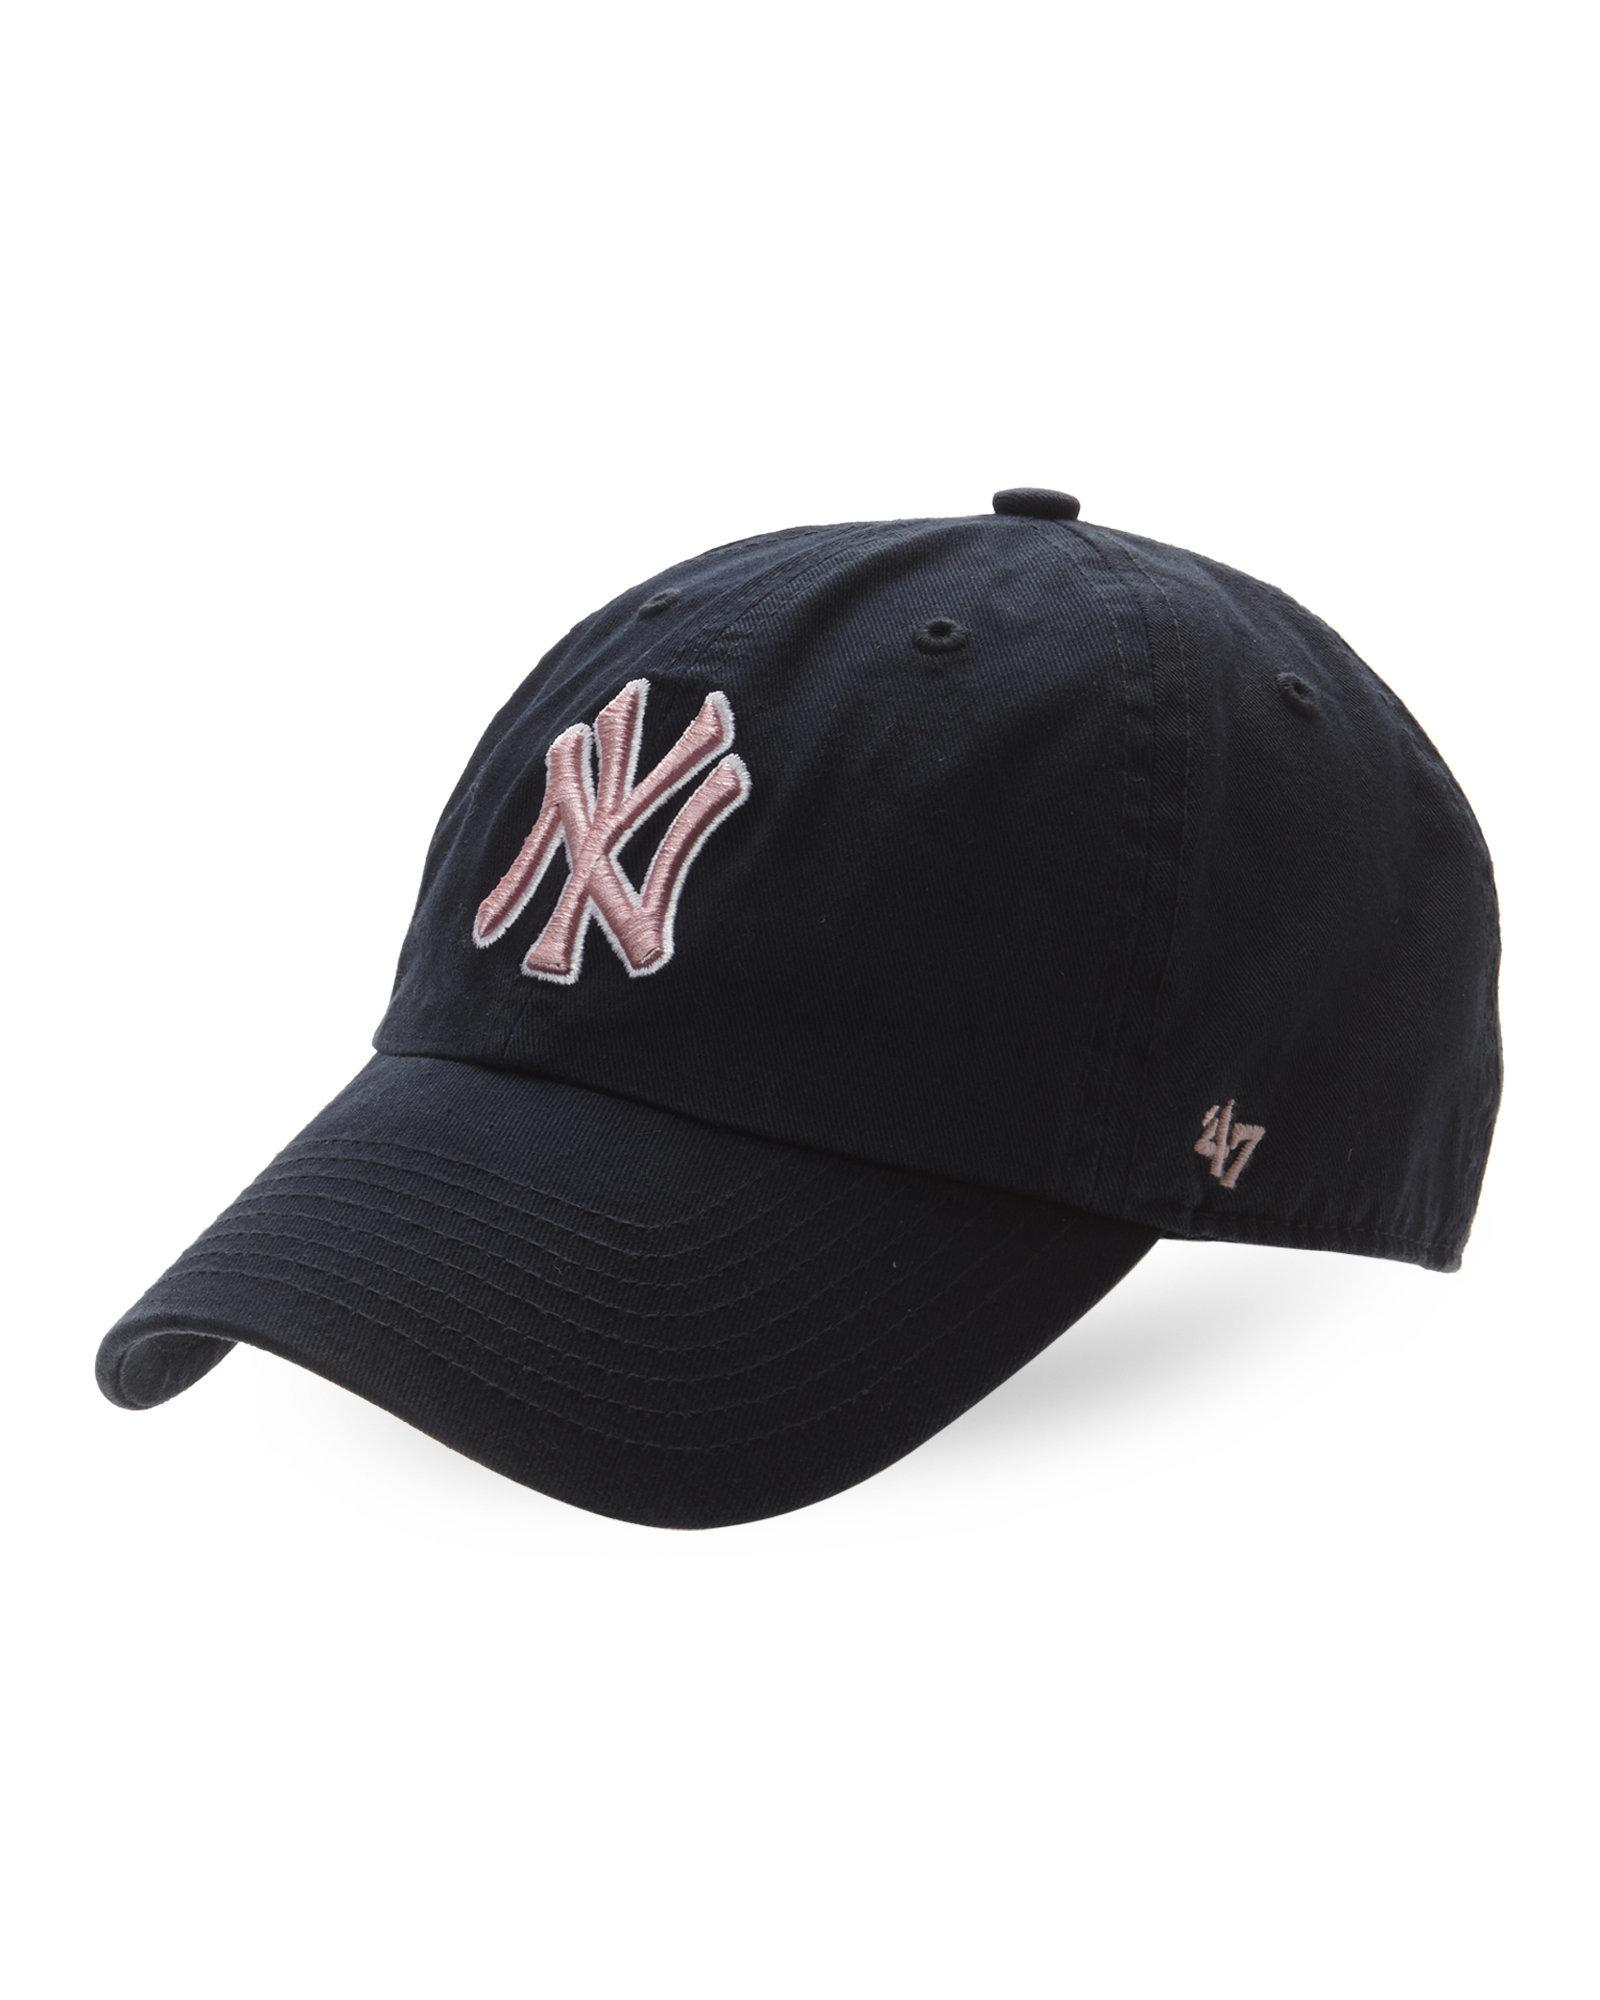 5c07e5ebb france new york yankees garment washed baseball cap 59fifty e8b83 49723